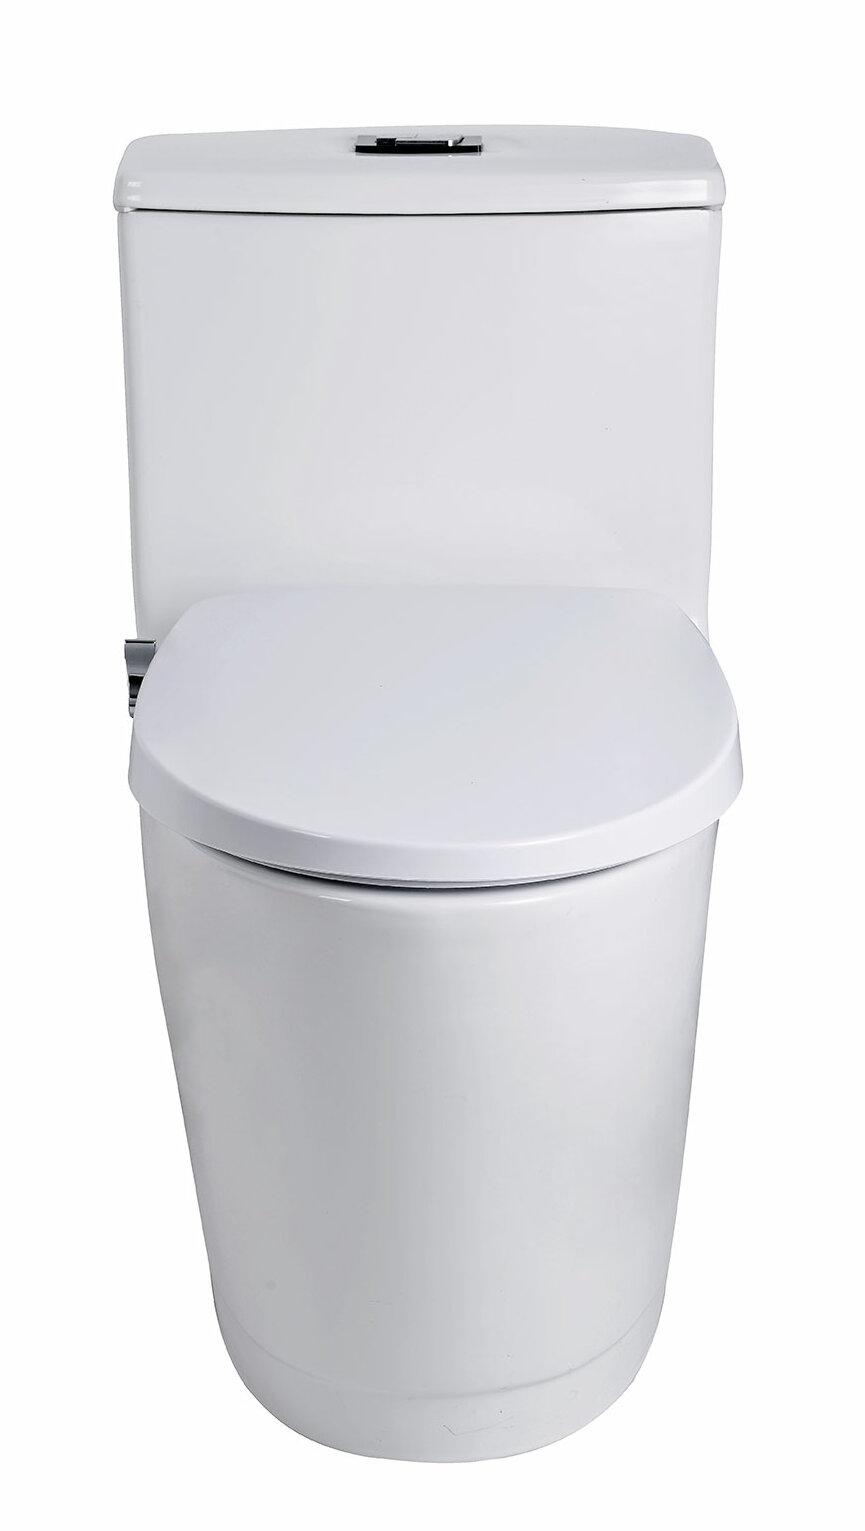 Bio Bidet The Stream Toilet Seat Bidets & Reviews | Wayfair